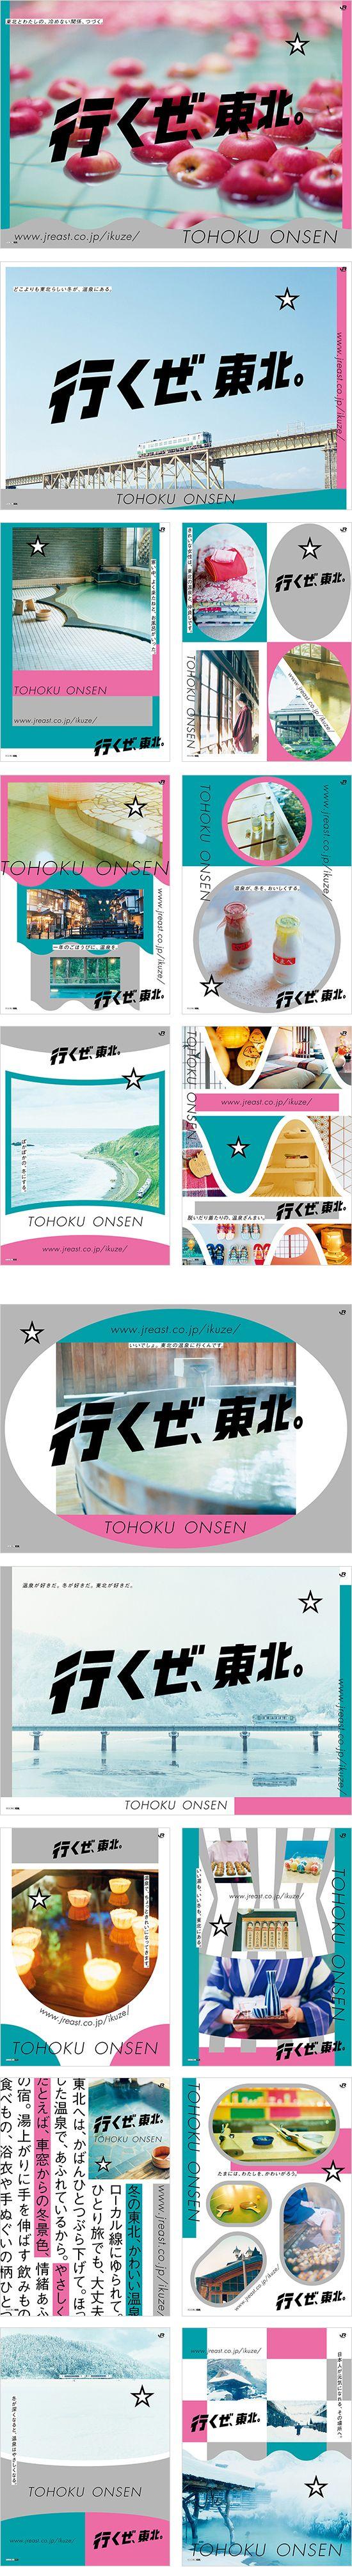 JR東日本:行くぜ、東北。2012 冬